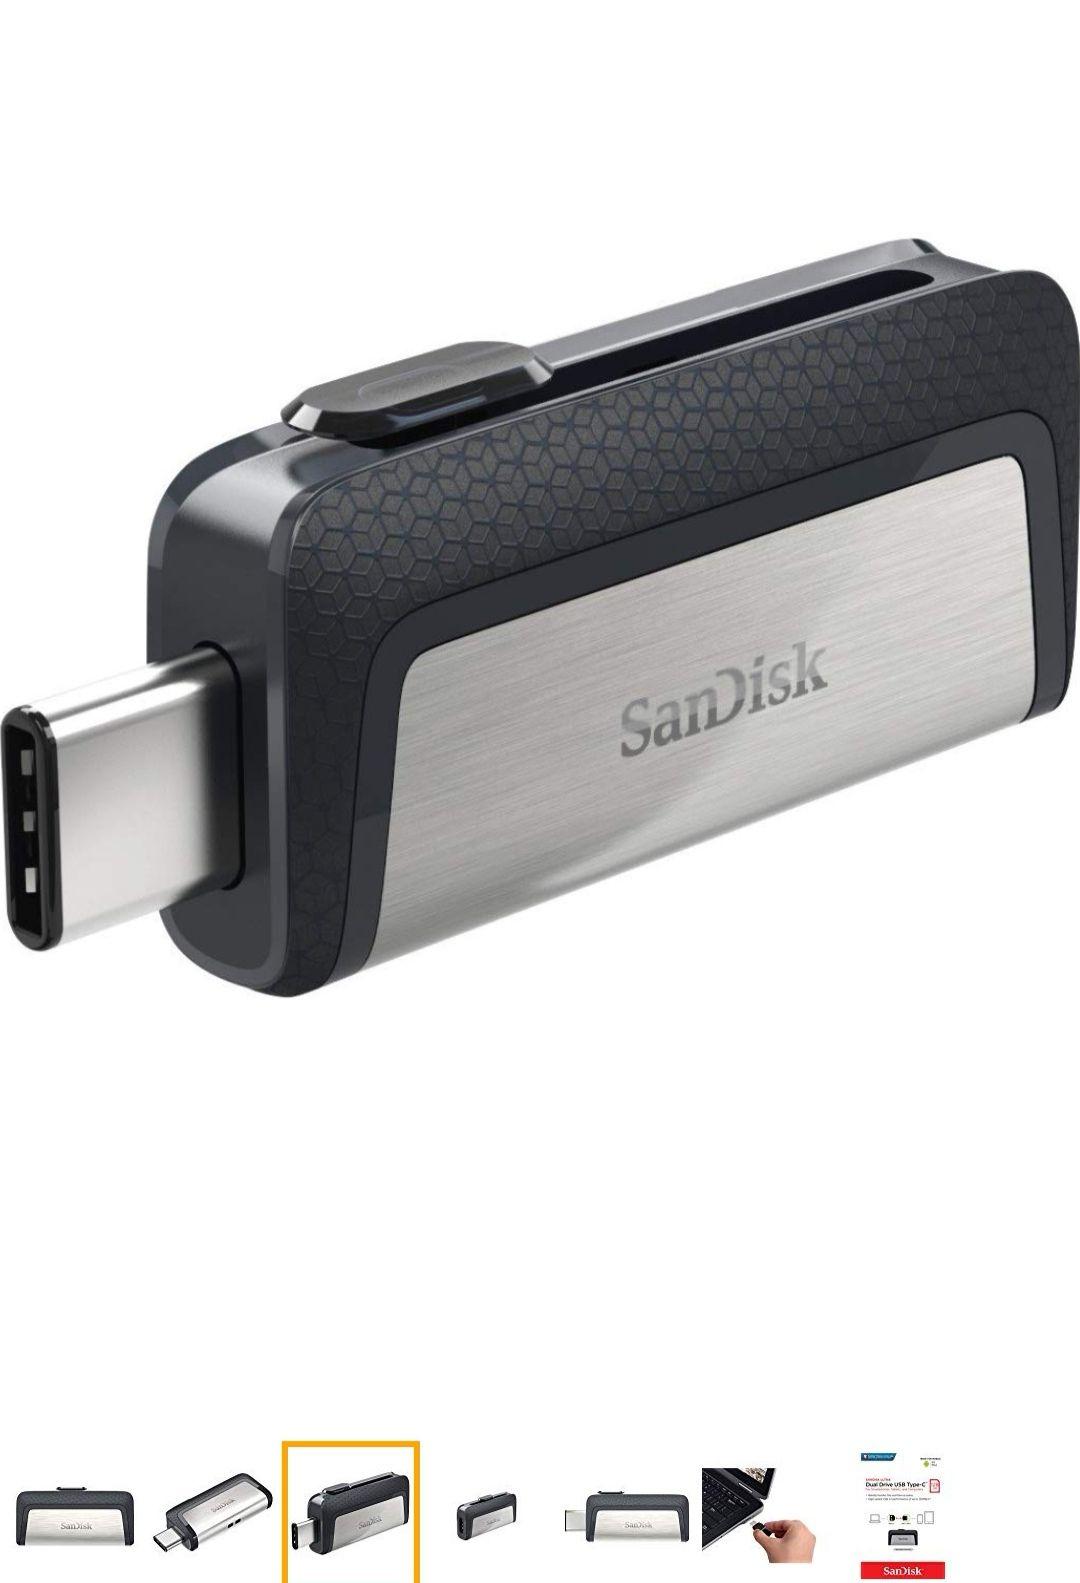 Amazon: SanDisk 128GB Ultra Dual Drive USB